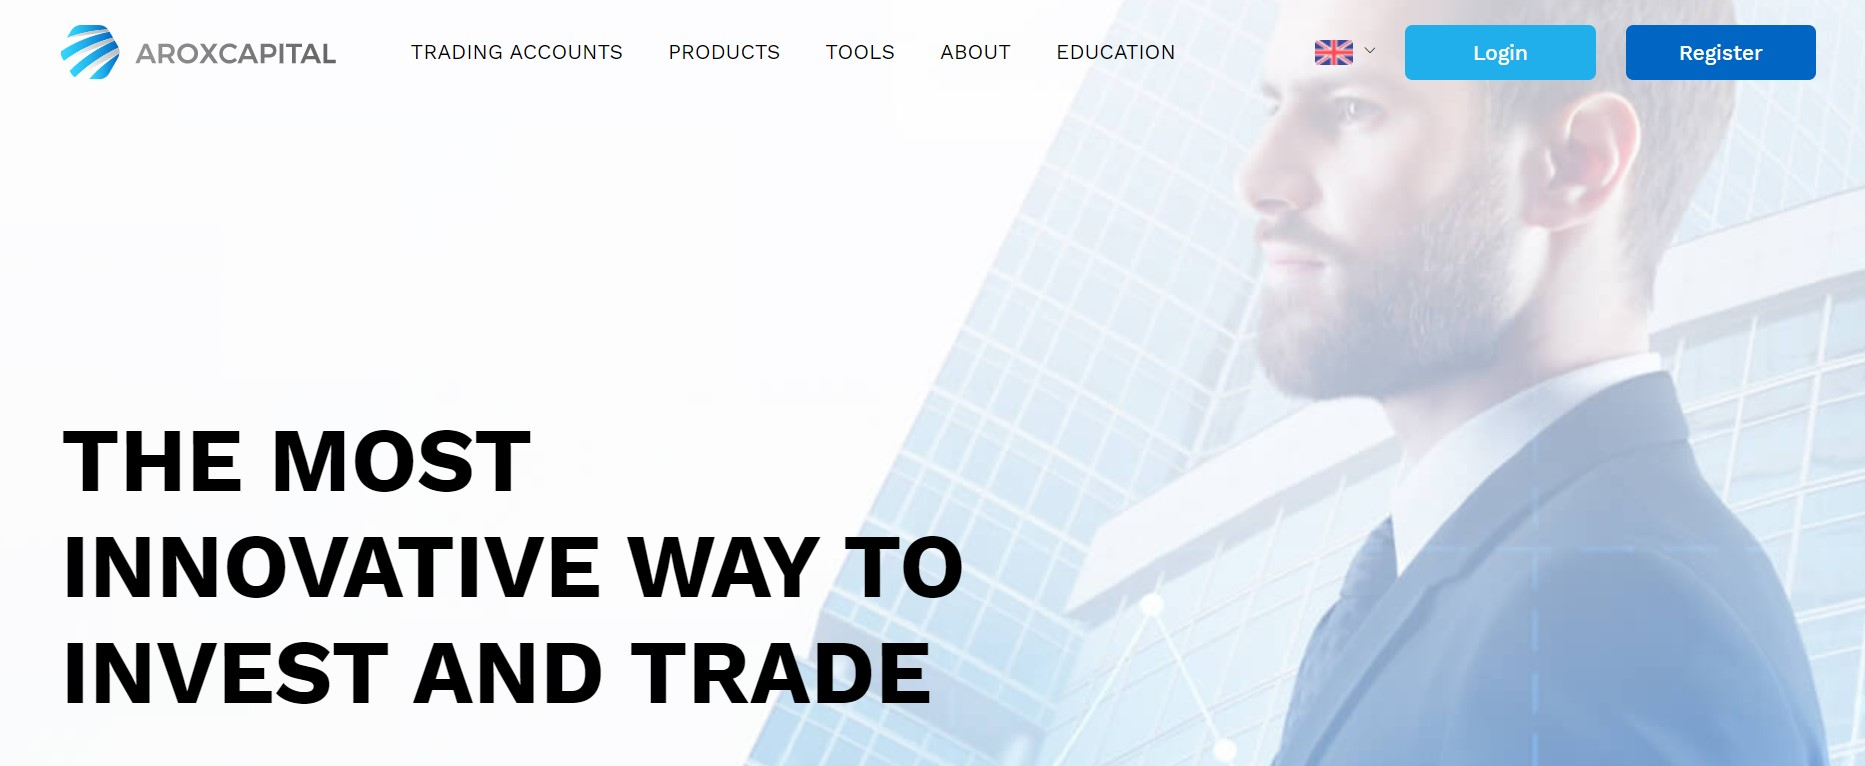 Aroxcapital website